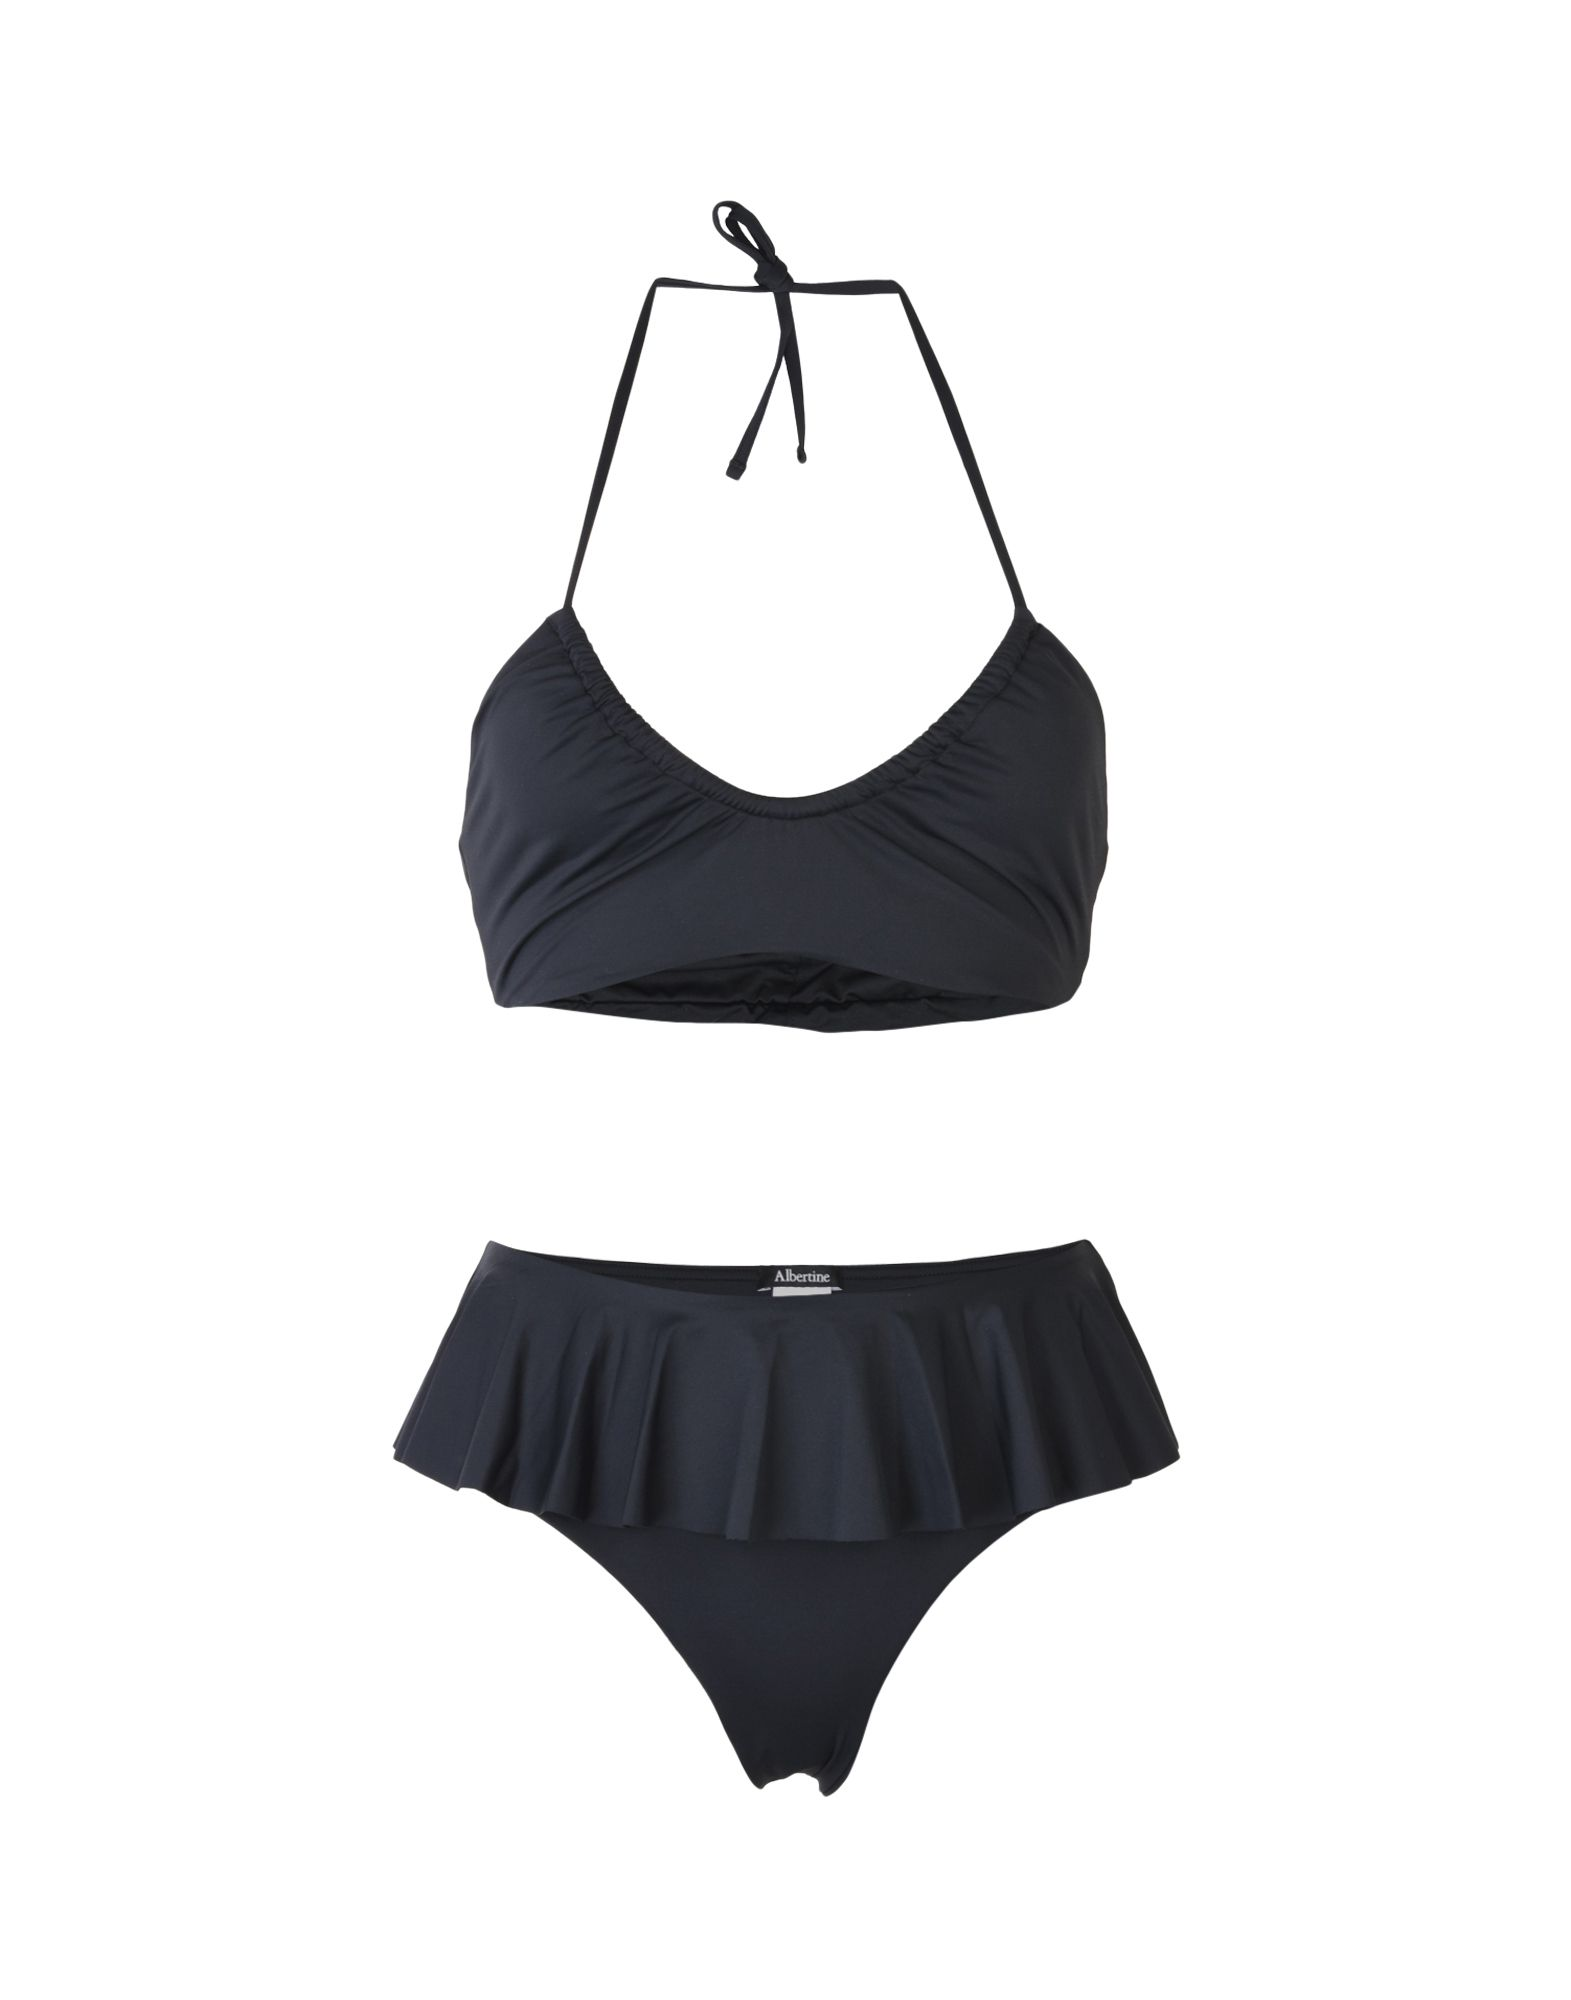 ALBERTINE Bikini in Black